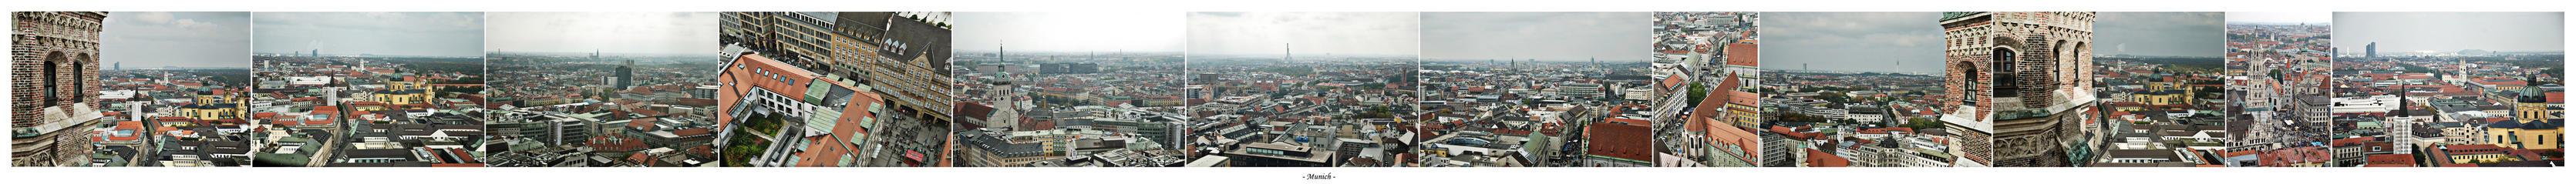 Munich by frescendine